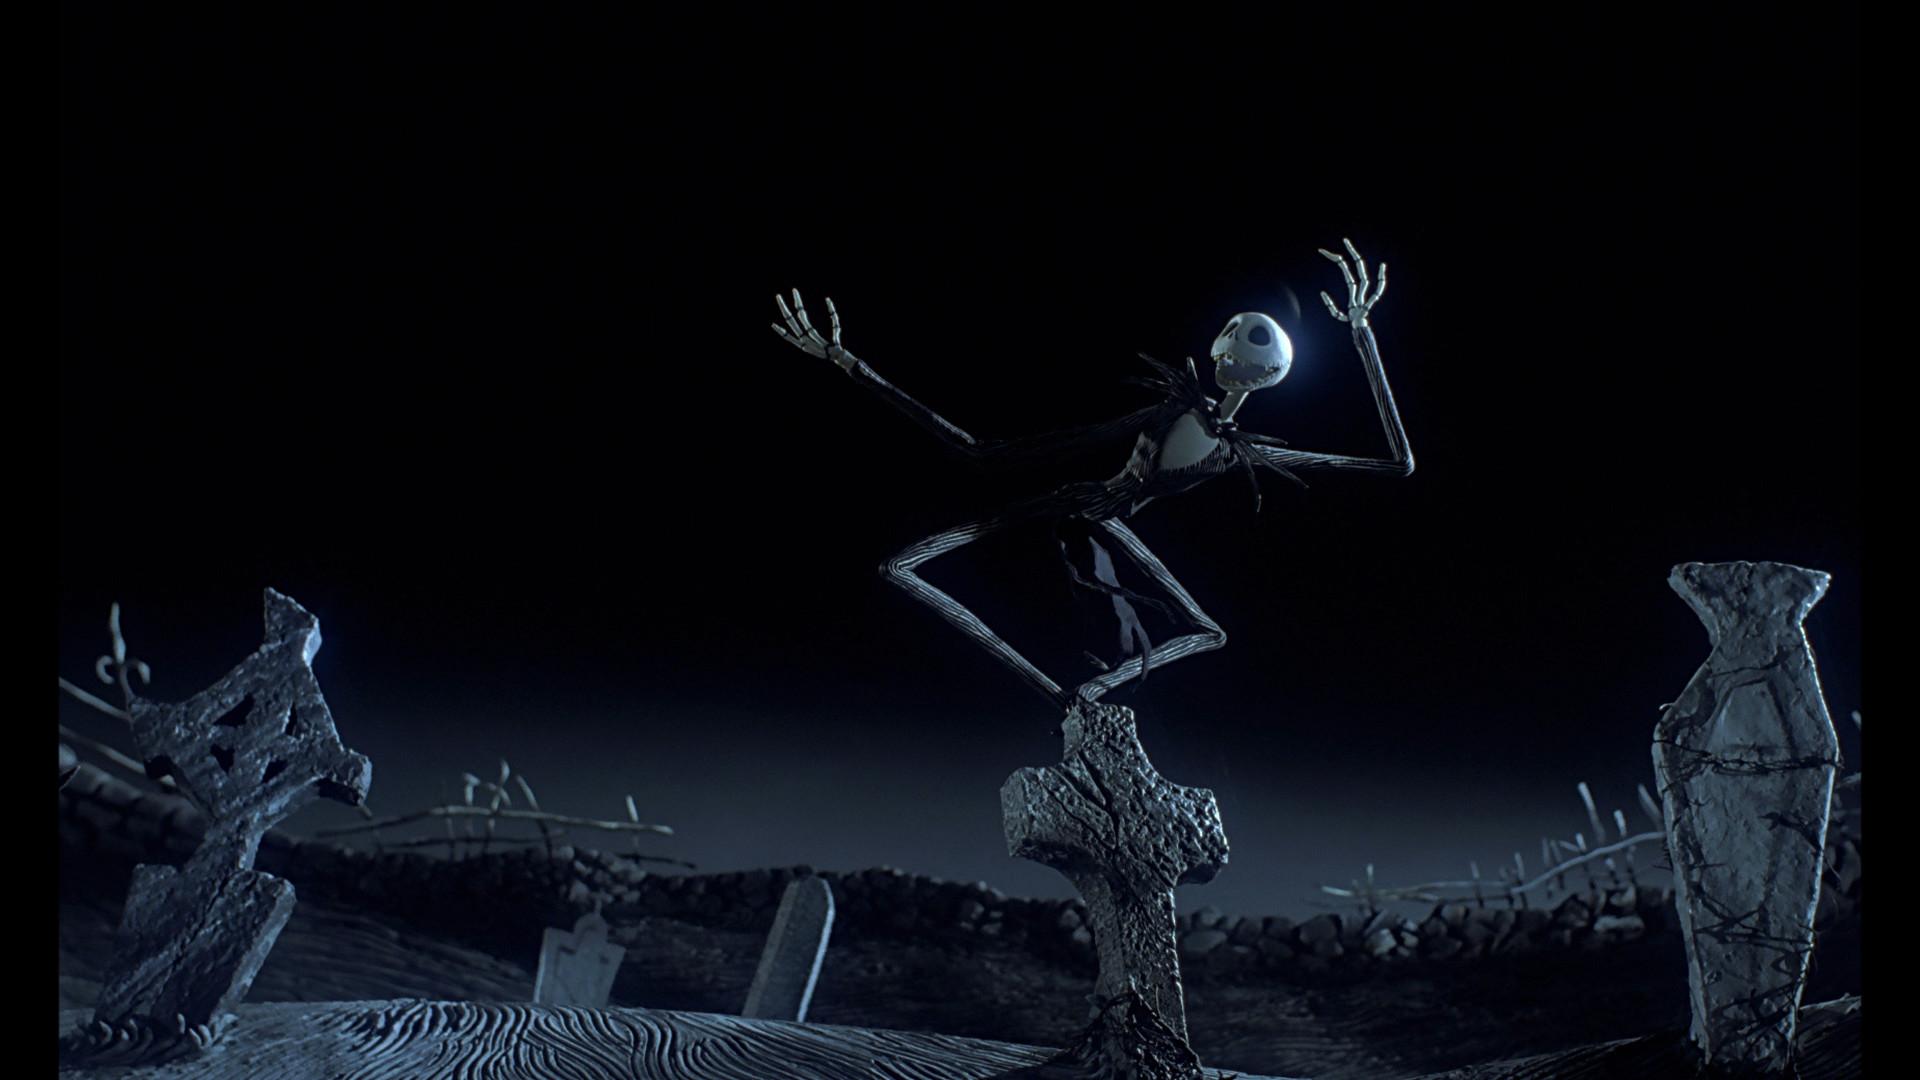 Jack Skellington – The Nightmare Before Christmas 721742